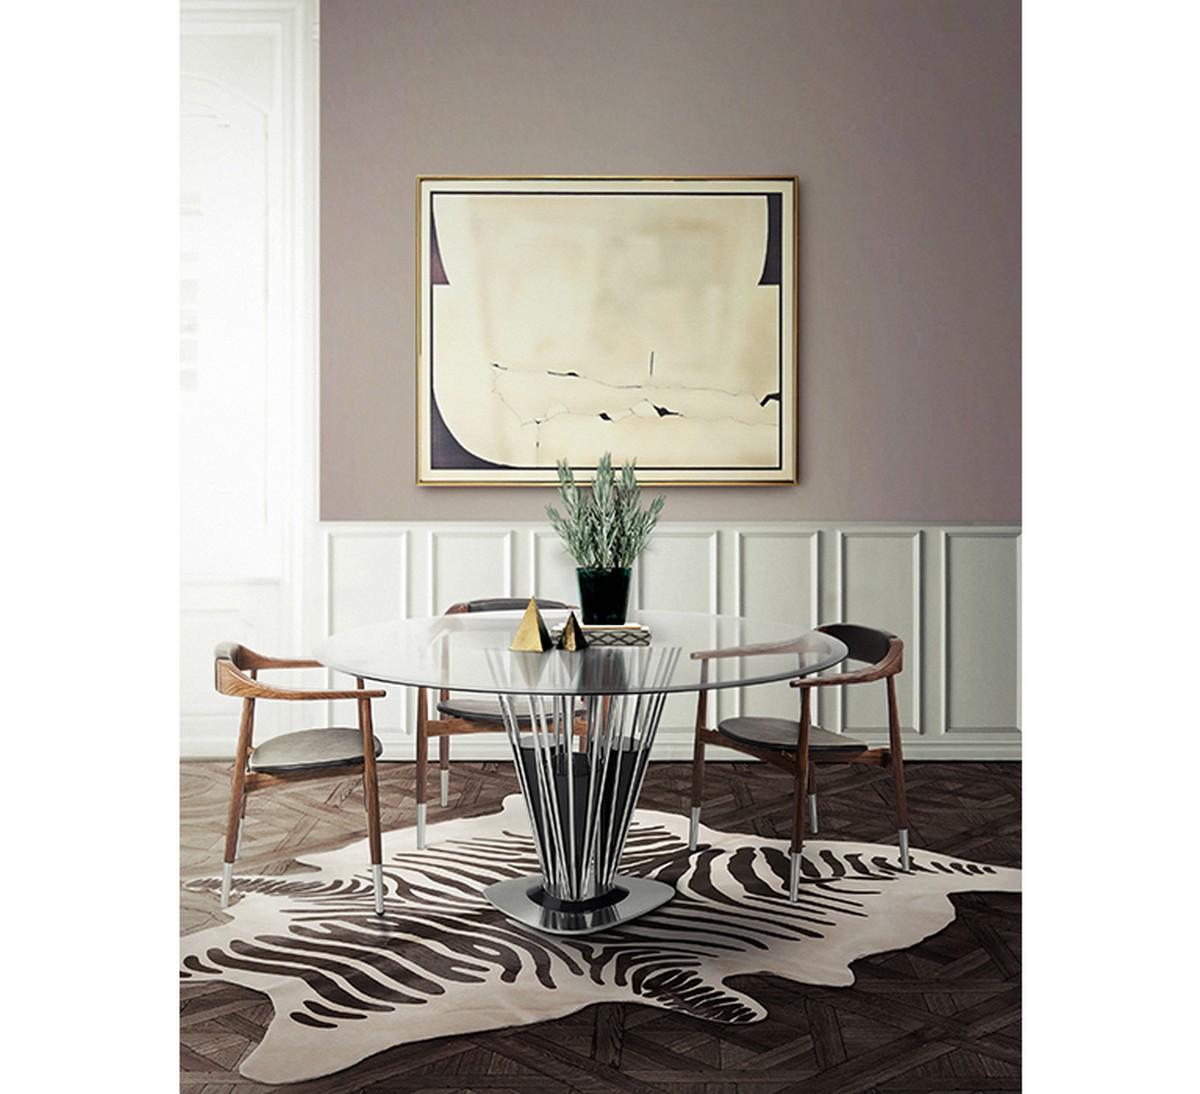 A Bit Classic, A Bit Modern: Perry Dining Chair By Essential Home dining chair A Bit Classic, A Bit Modern: Perry Dining Chair By Essential Home 2 10